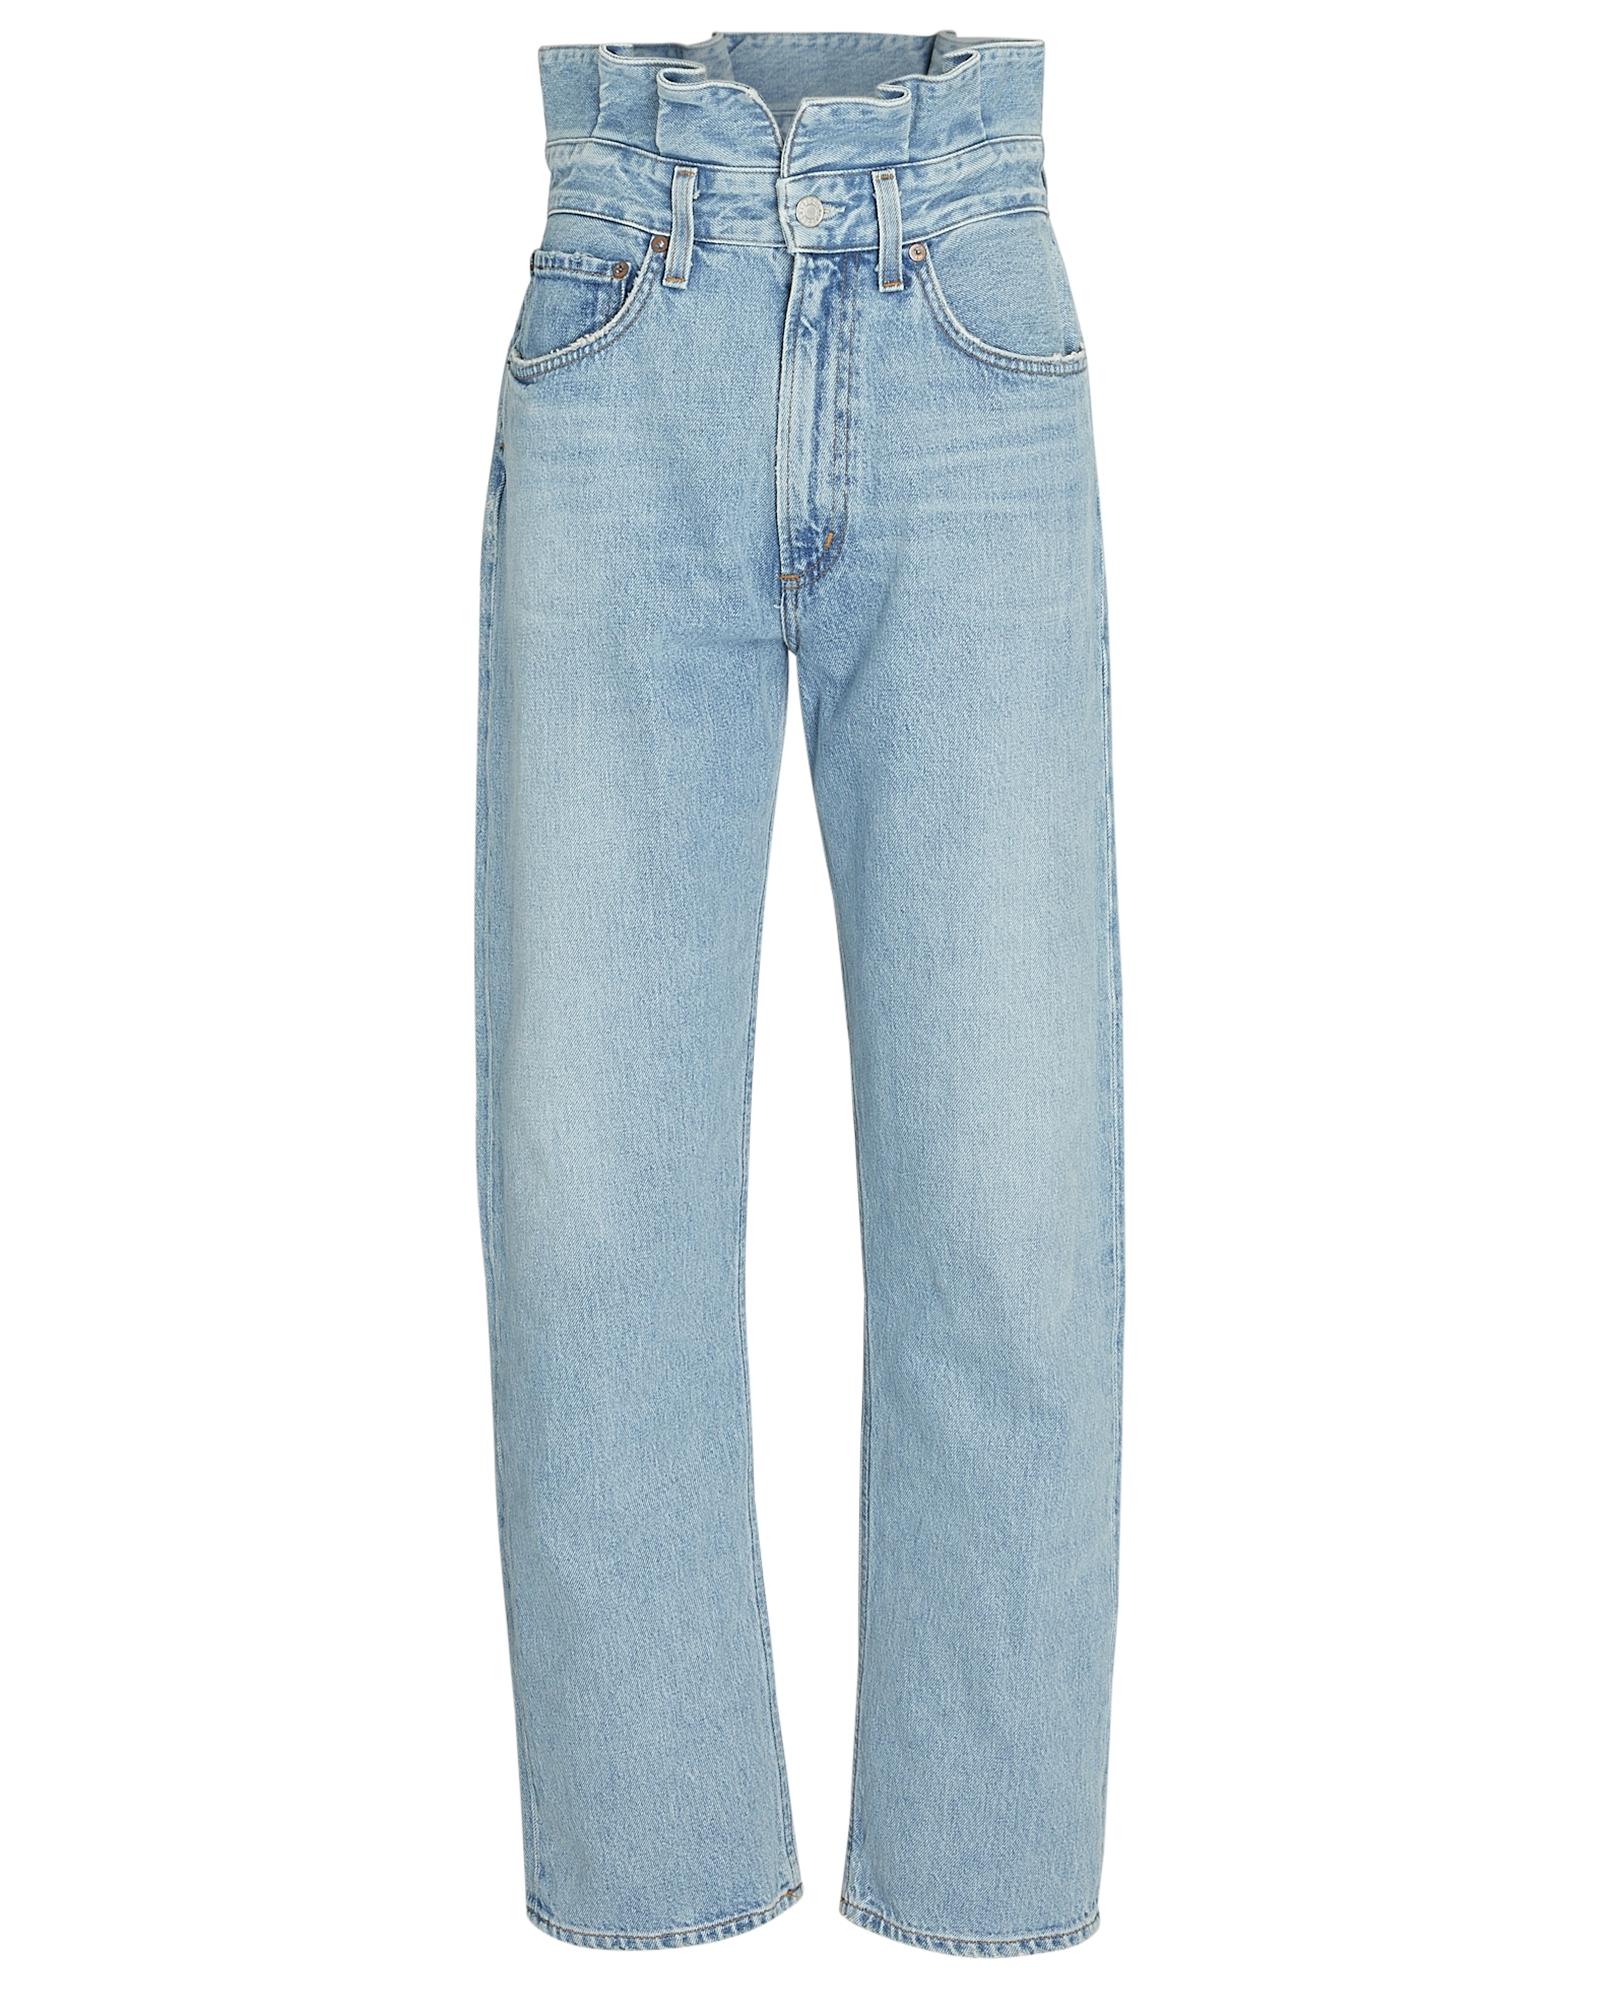 Agolde Pants Lettuce Waist Wide-Leg Jeans